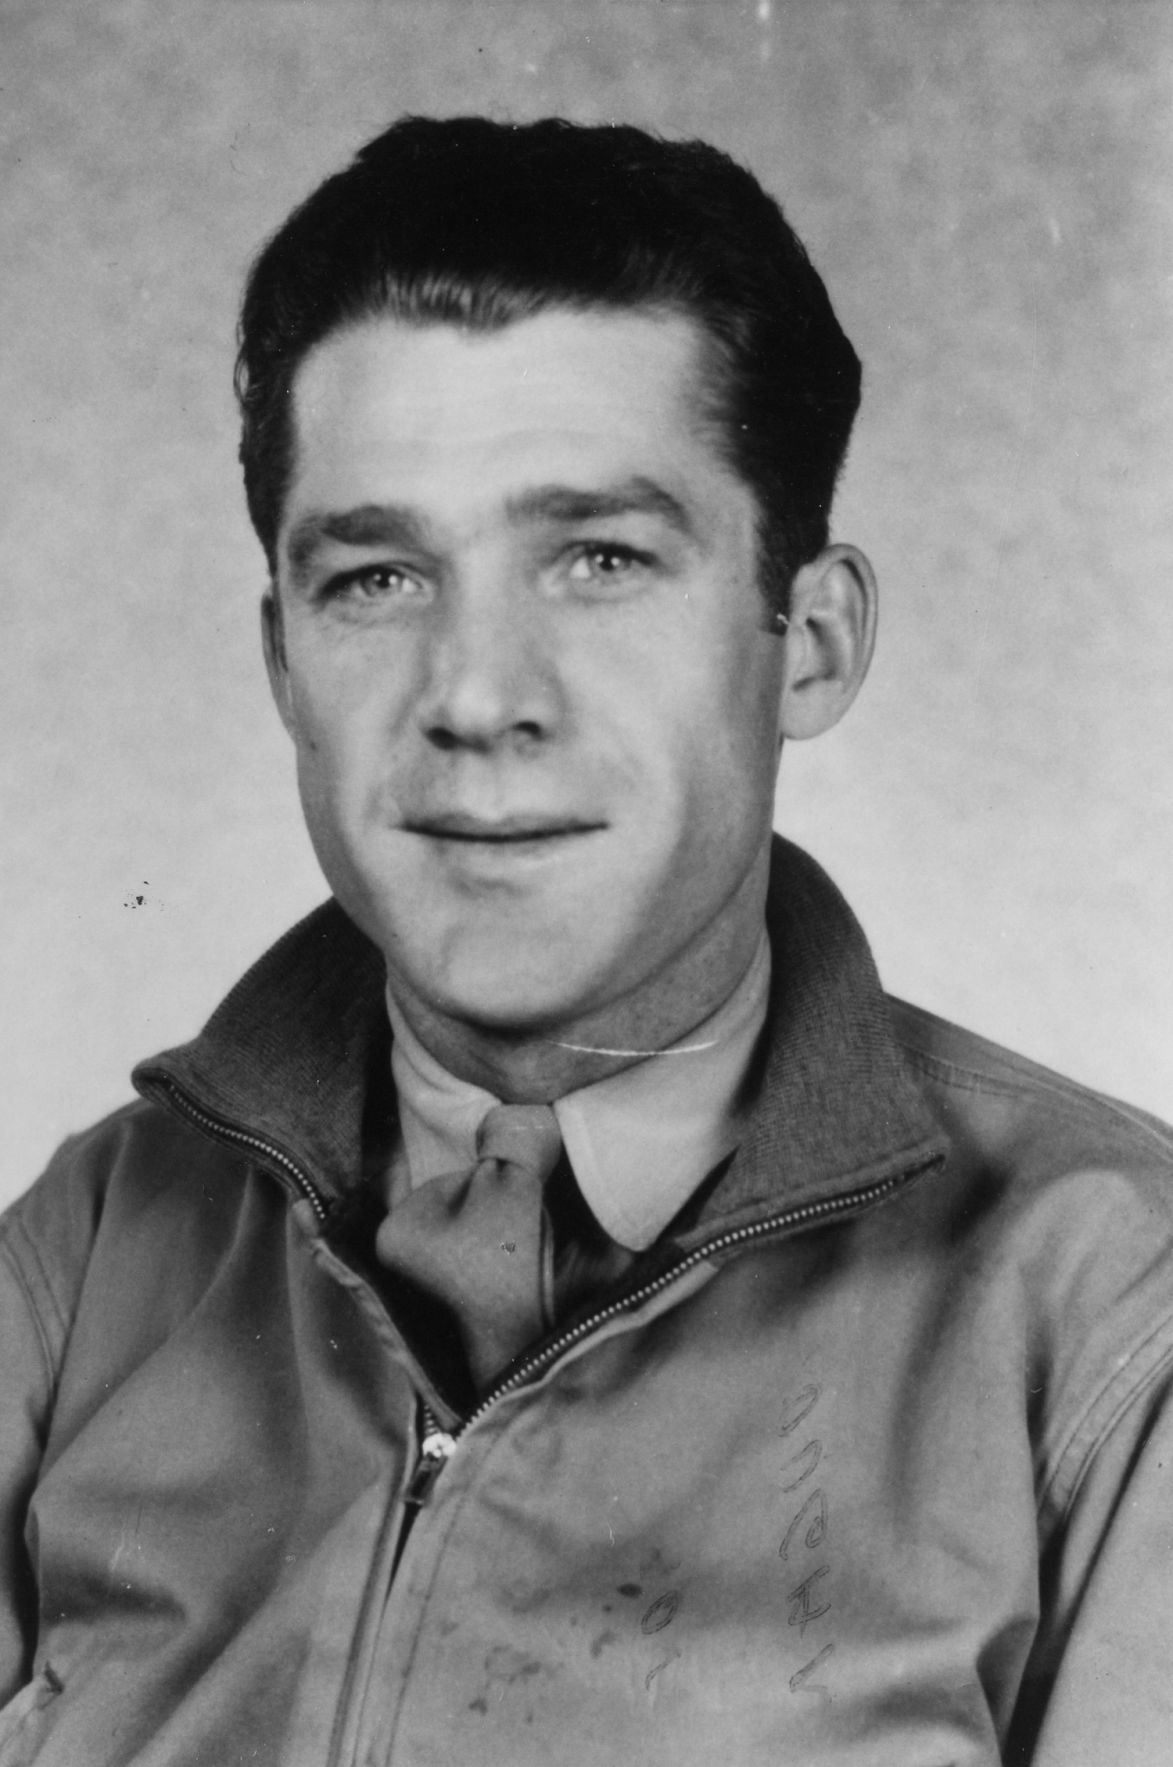 Staff Sgt. Thomas McCaslin - mug